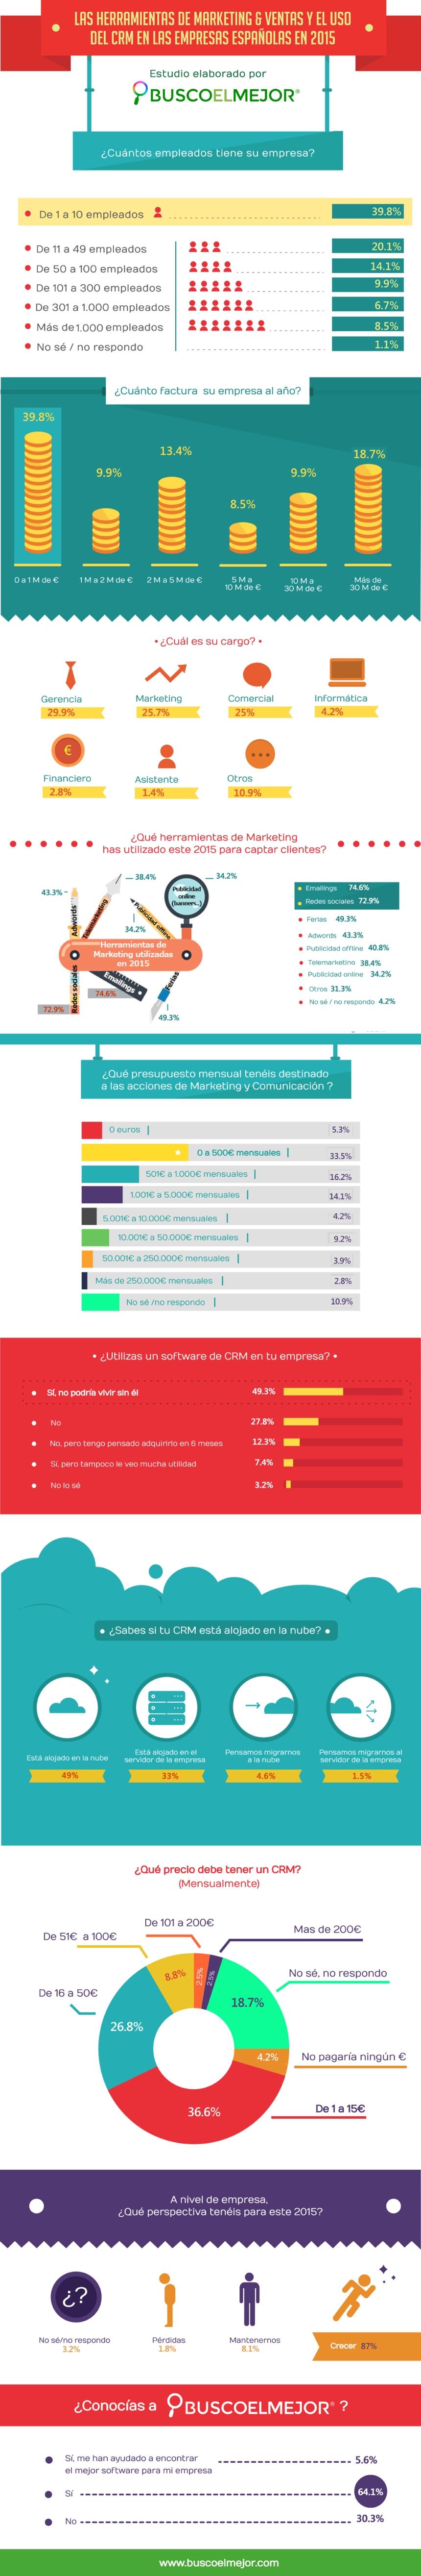 Técnicas de marketing preferidas por las empresas españolas